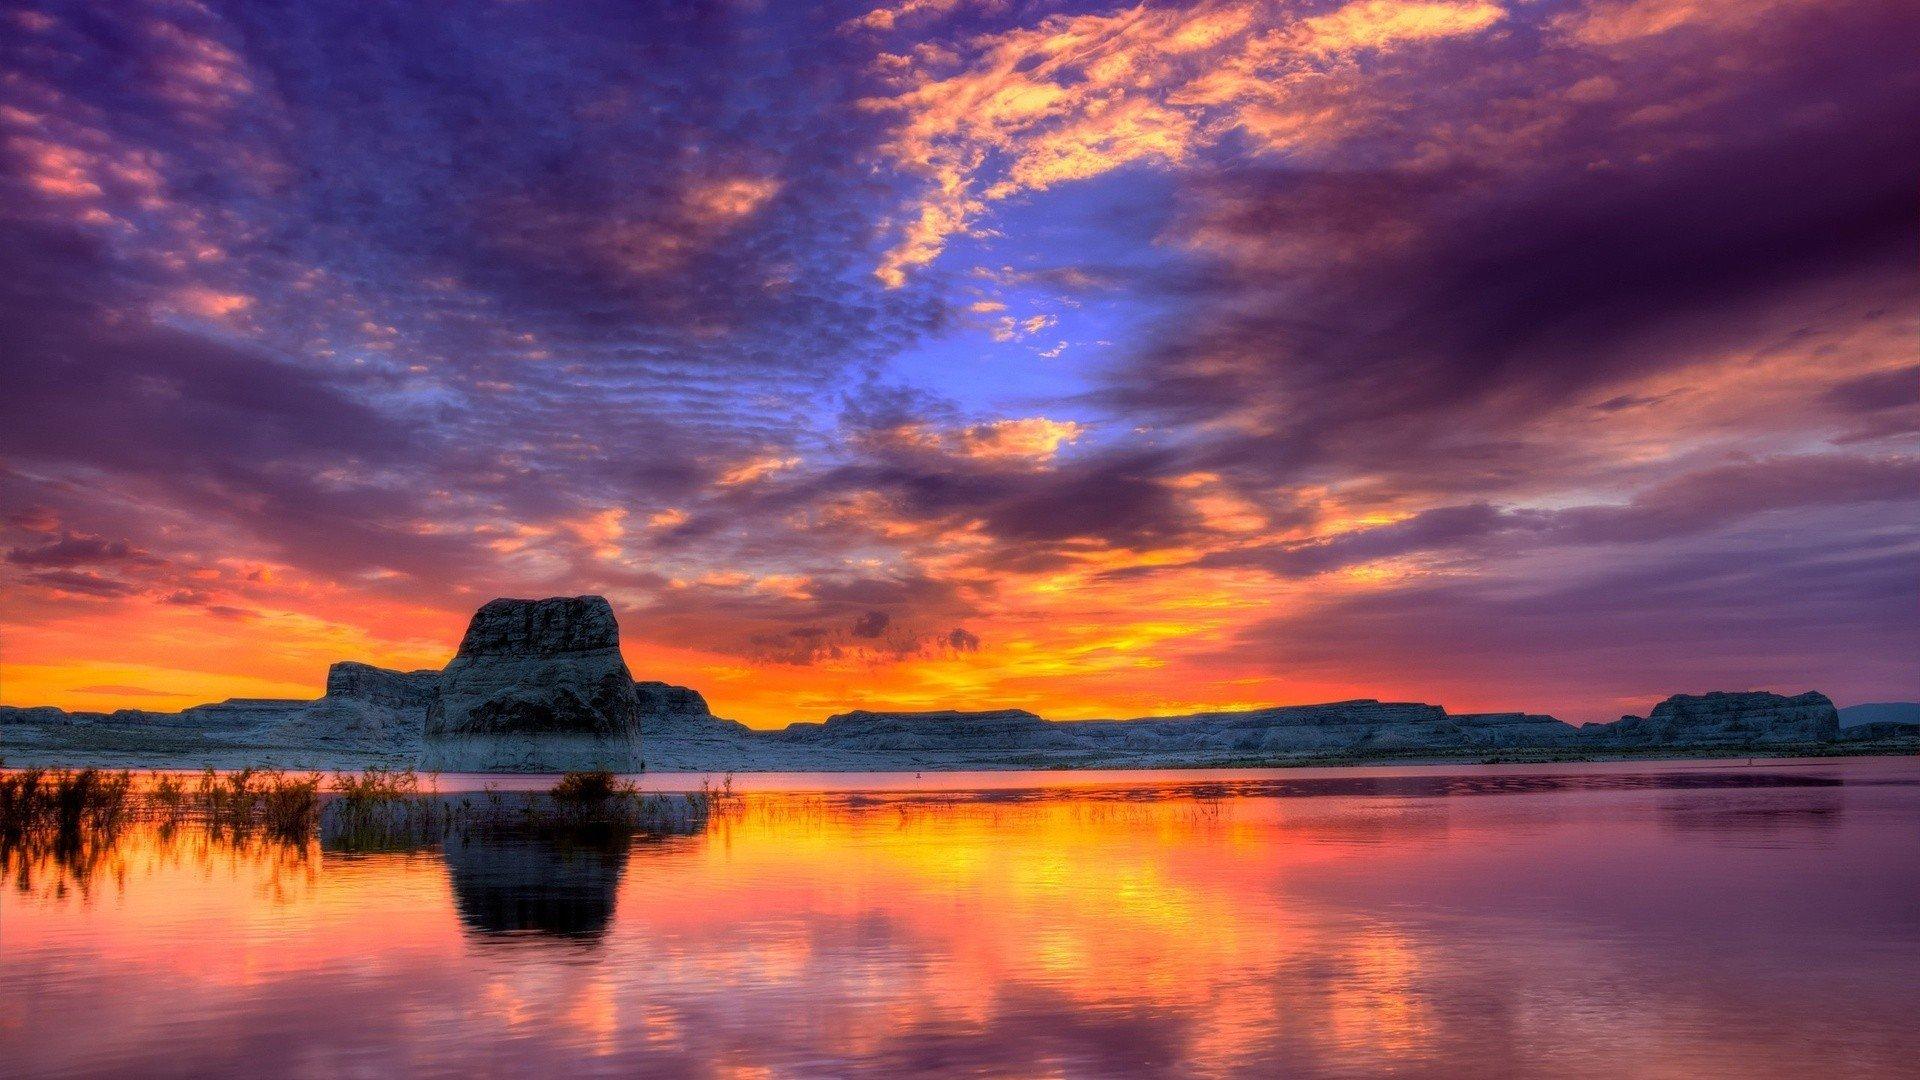 nature lake sunset landscape ultrahd 4k wallpaper wallpaper background 1920x1080